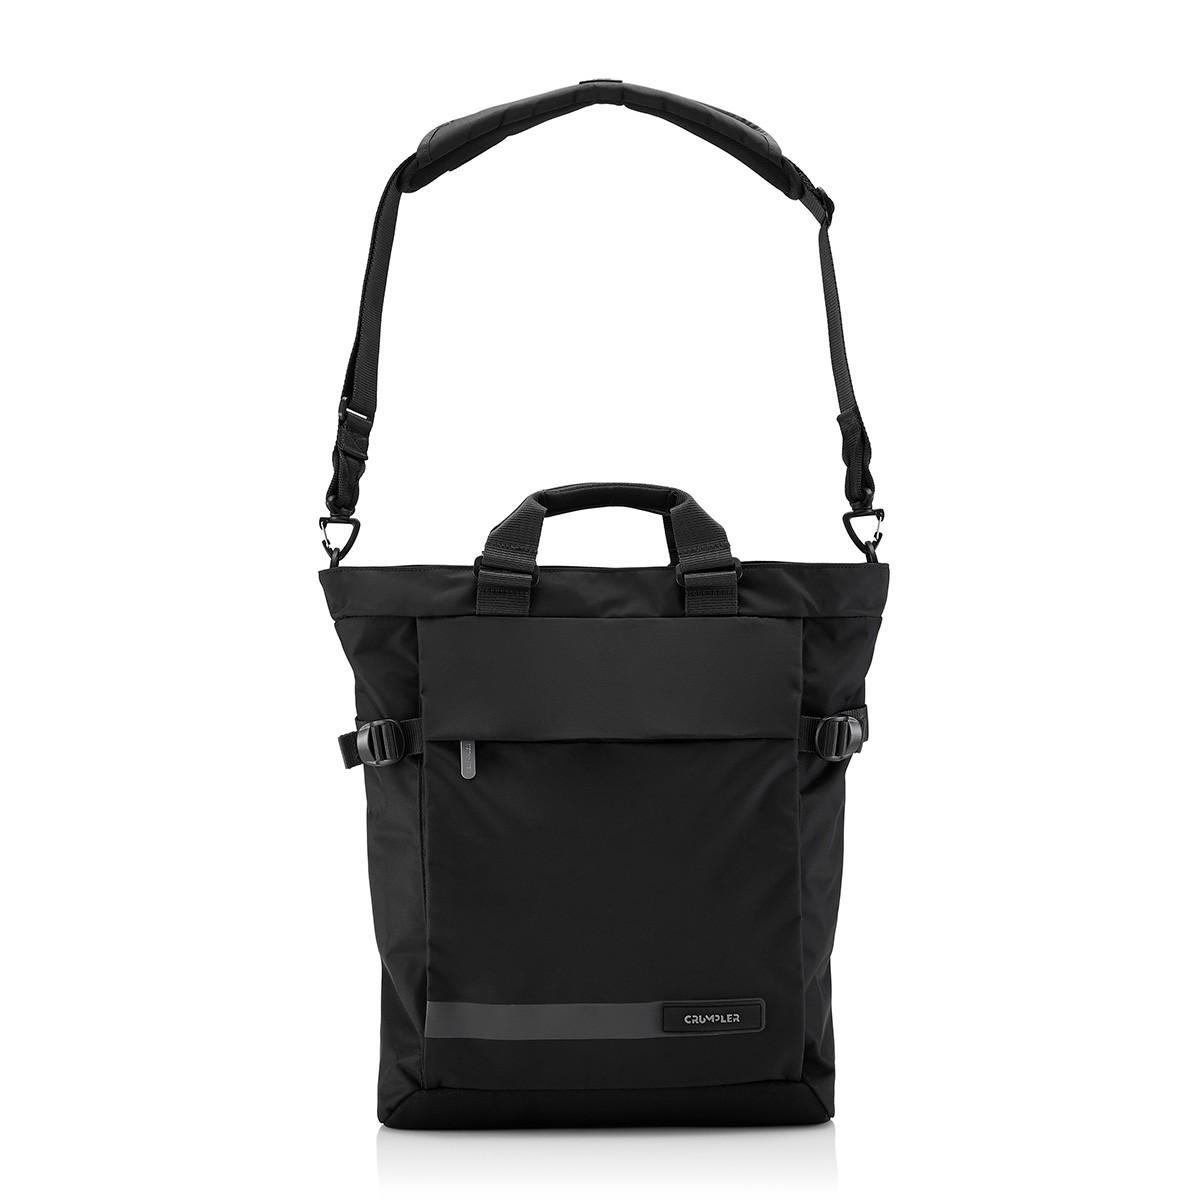 ac94039bb2 Buy High Quality Crumpler Bag Online